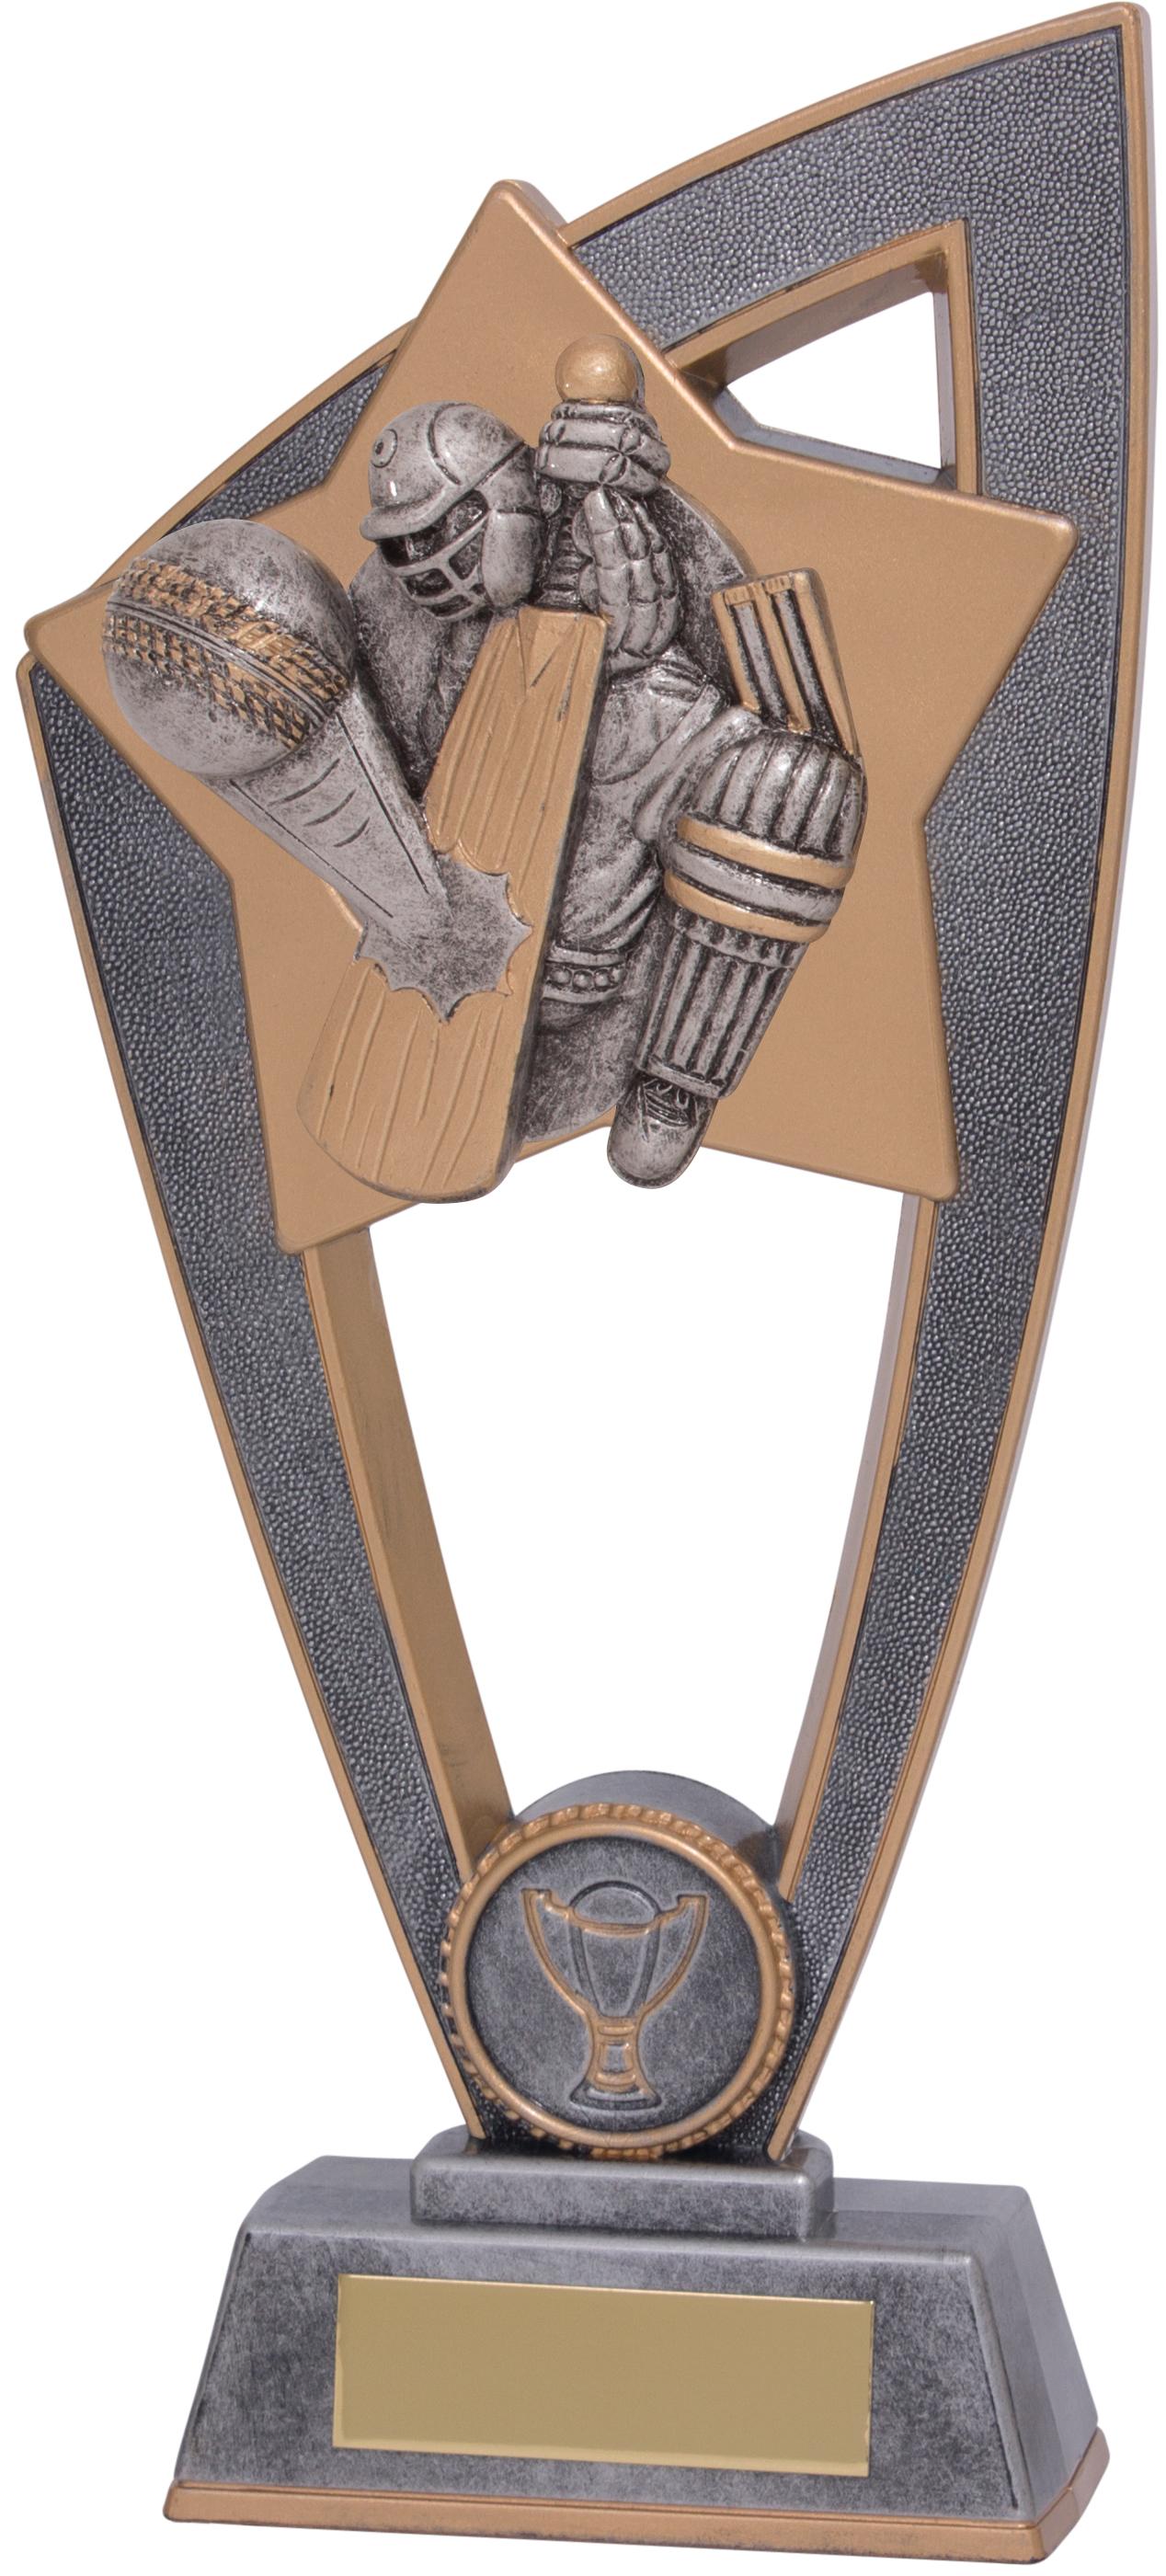 "Cricket Batsman Star Blast Trophy 23cm (9"")"